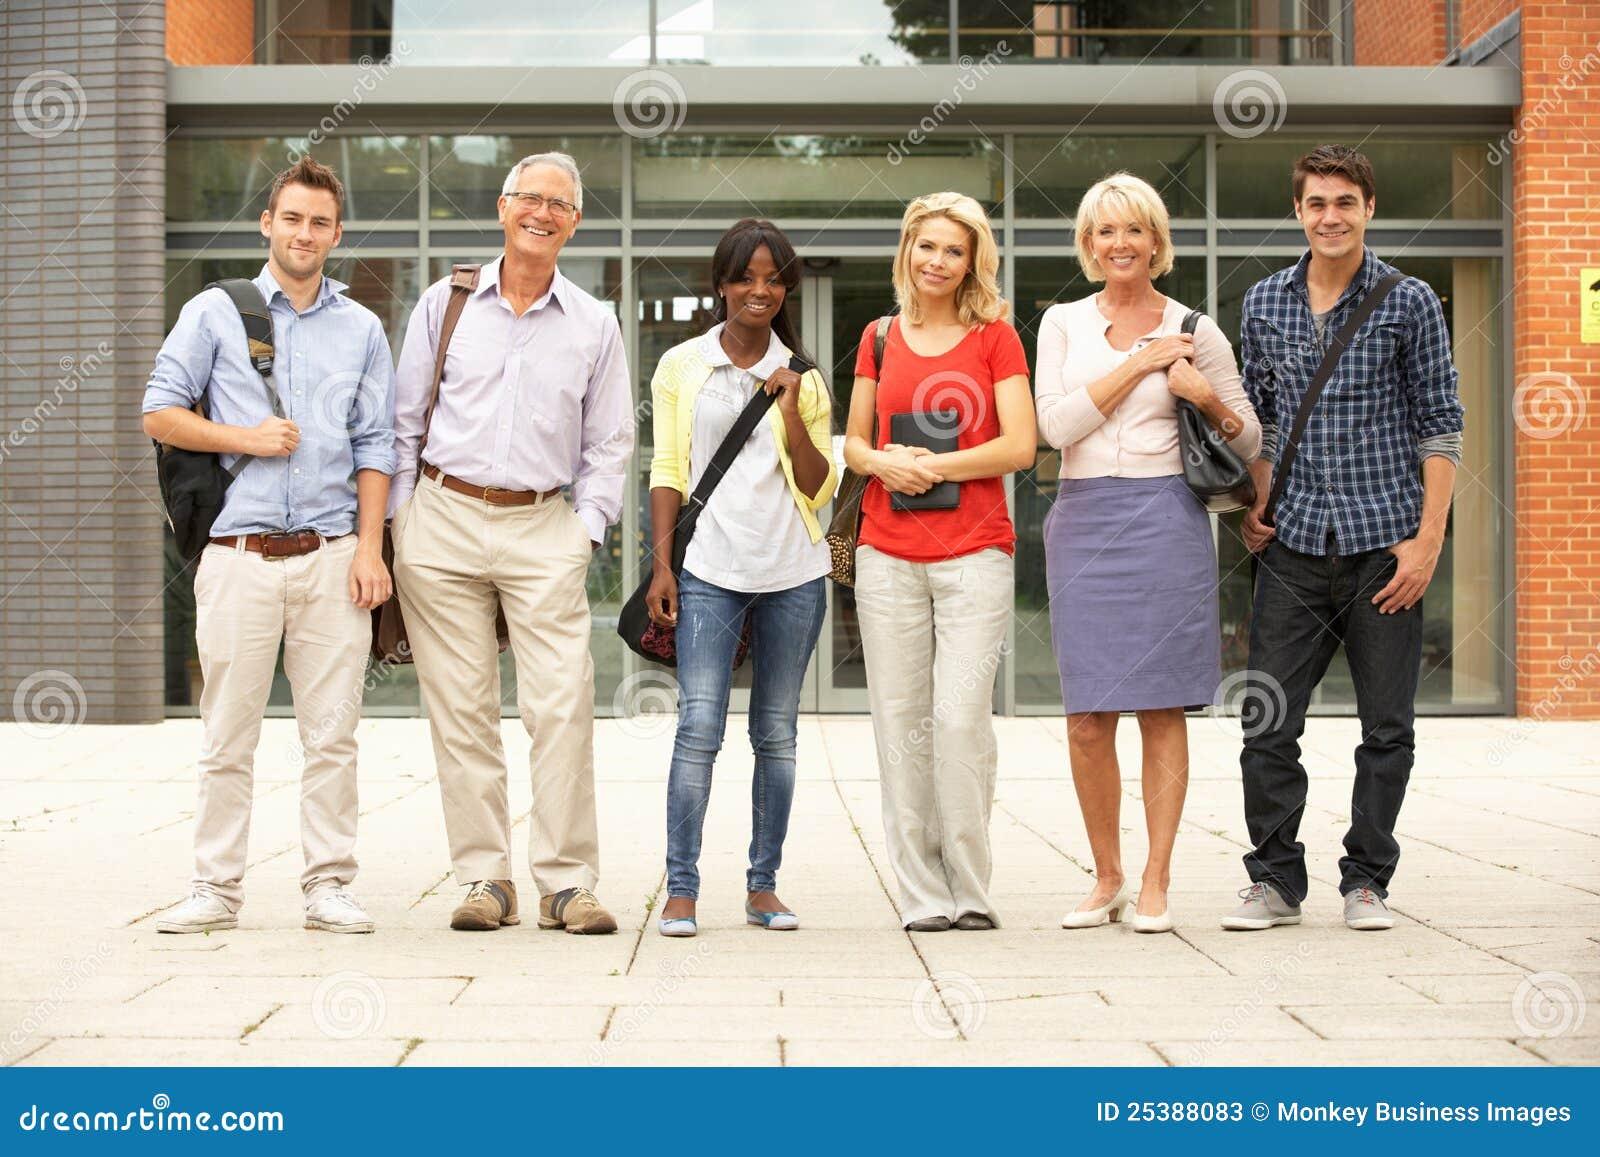 Grupo mezclado de estudiantes fuera de la universidad